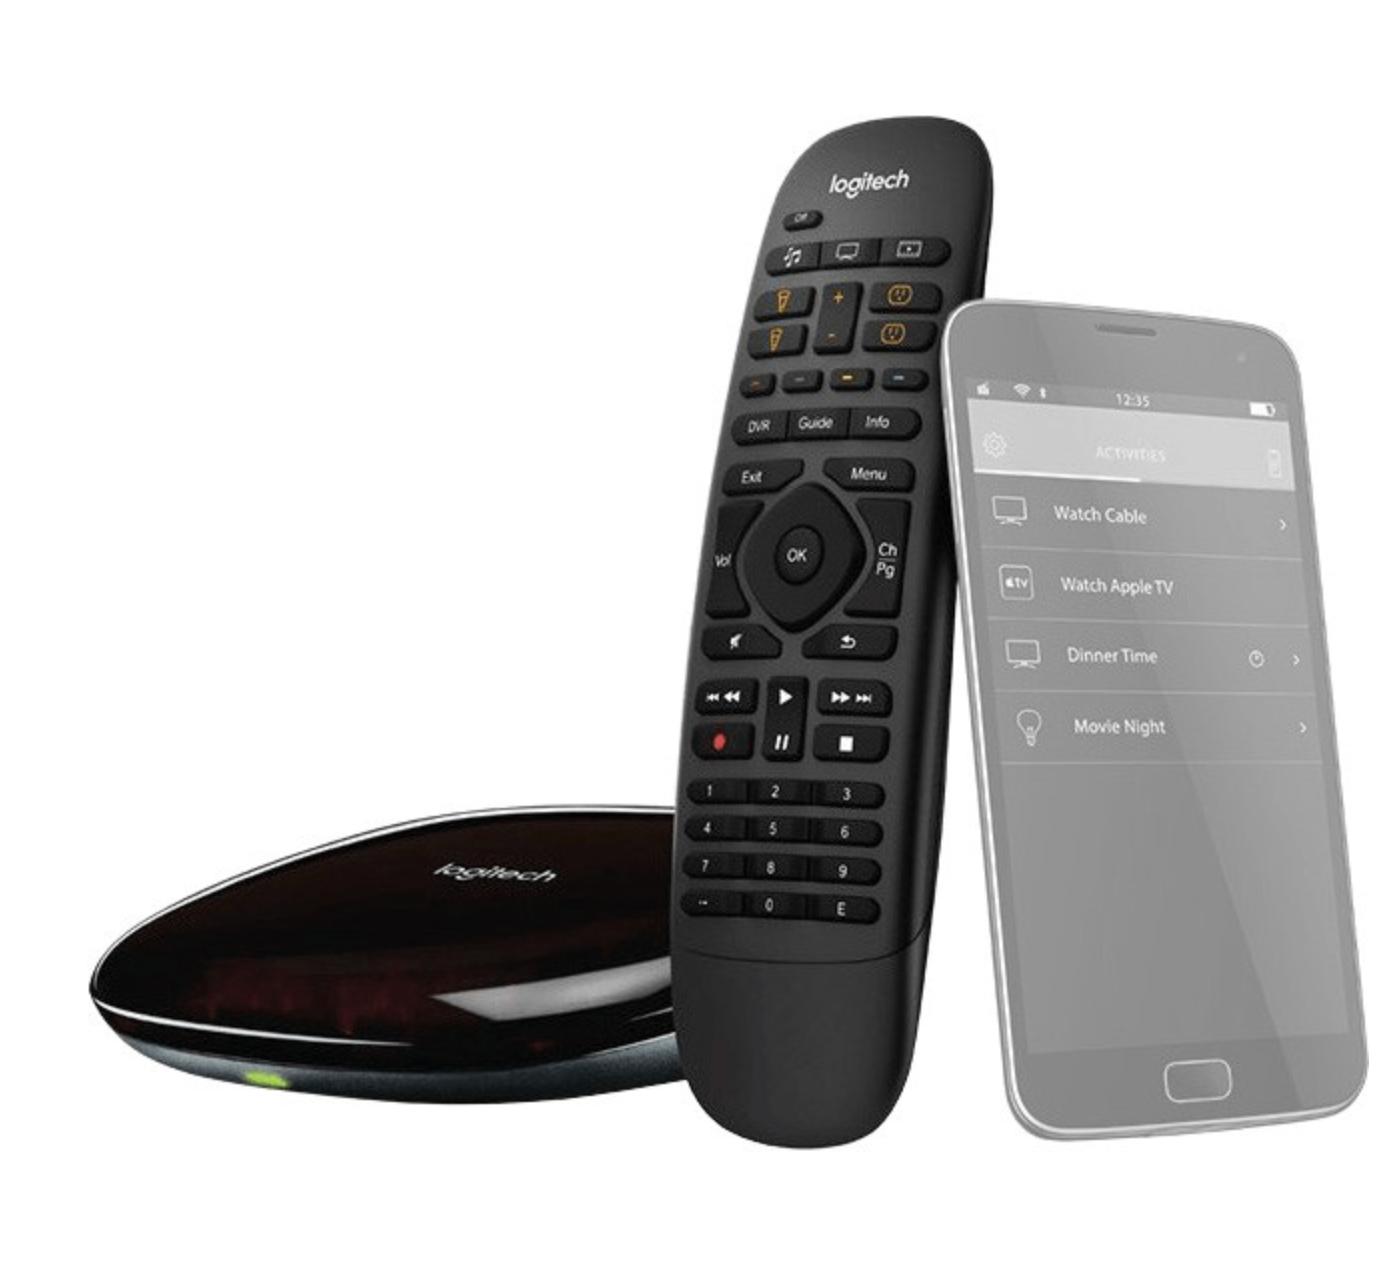 Logitech Harmony Companion Universalfernbedienung inkl. Hub bei [Media Markt] + Logitech Harmony 350 für 24€